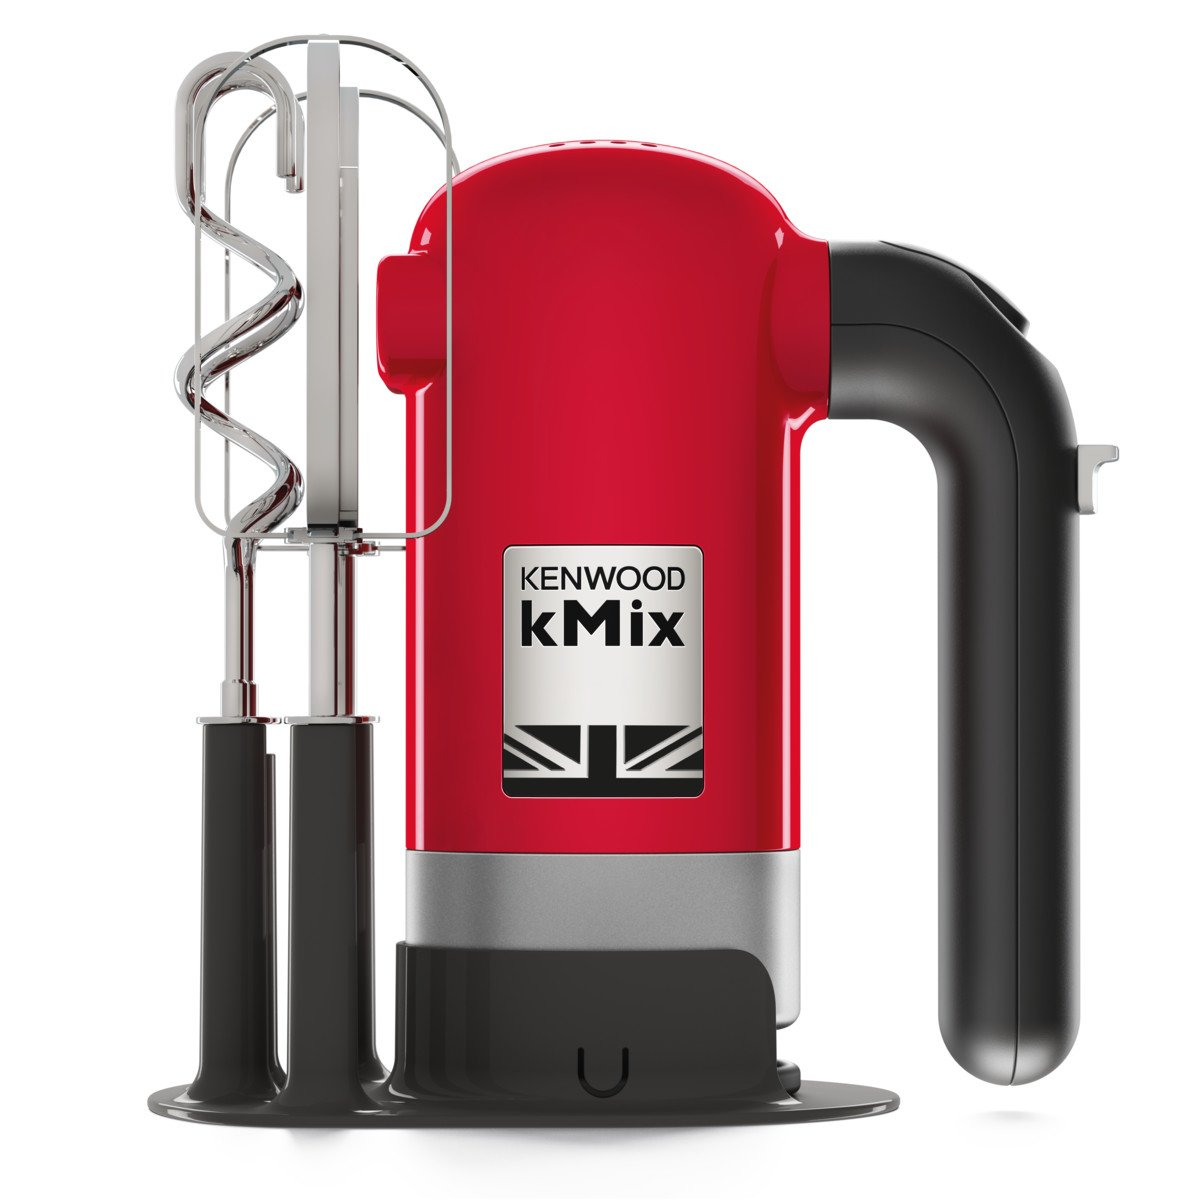 Kenwood Electronics HMX750RD Sbattitore manuale 350W Rosso